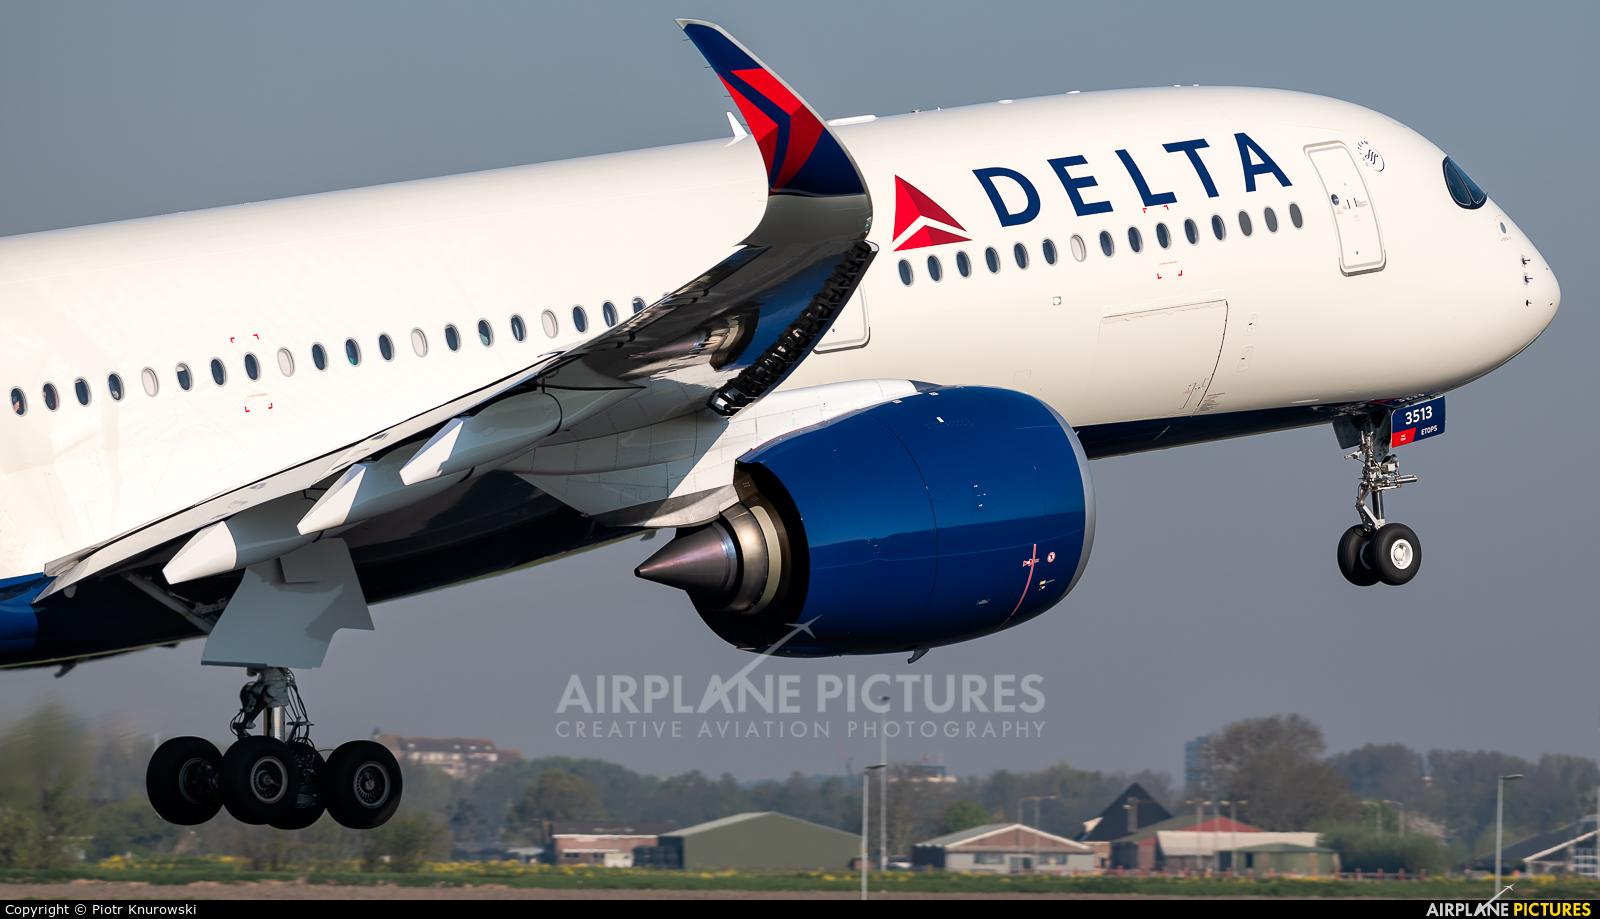 Delta Air Lines N513DZ aircraft at Amsterdam - Schiphol